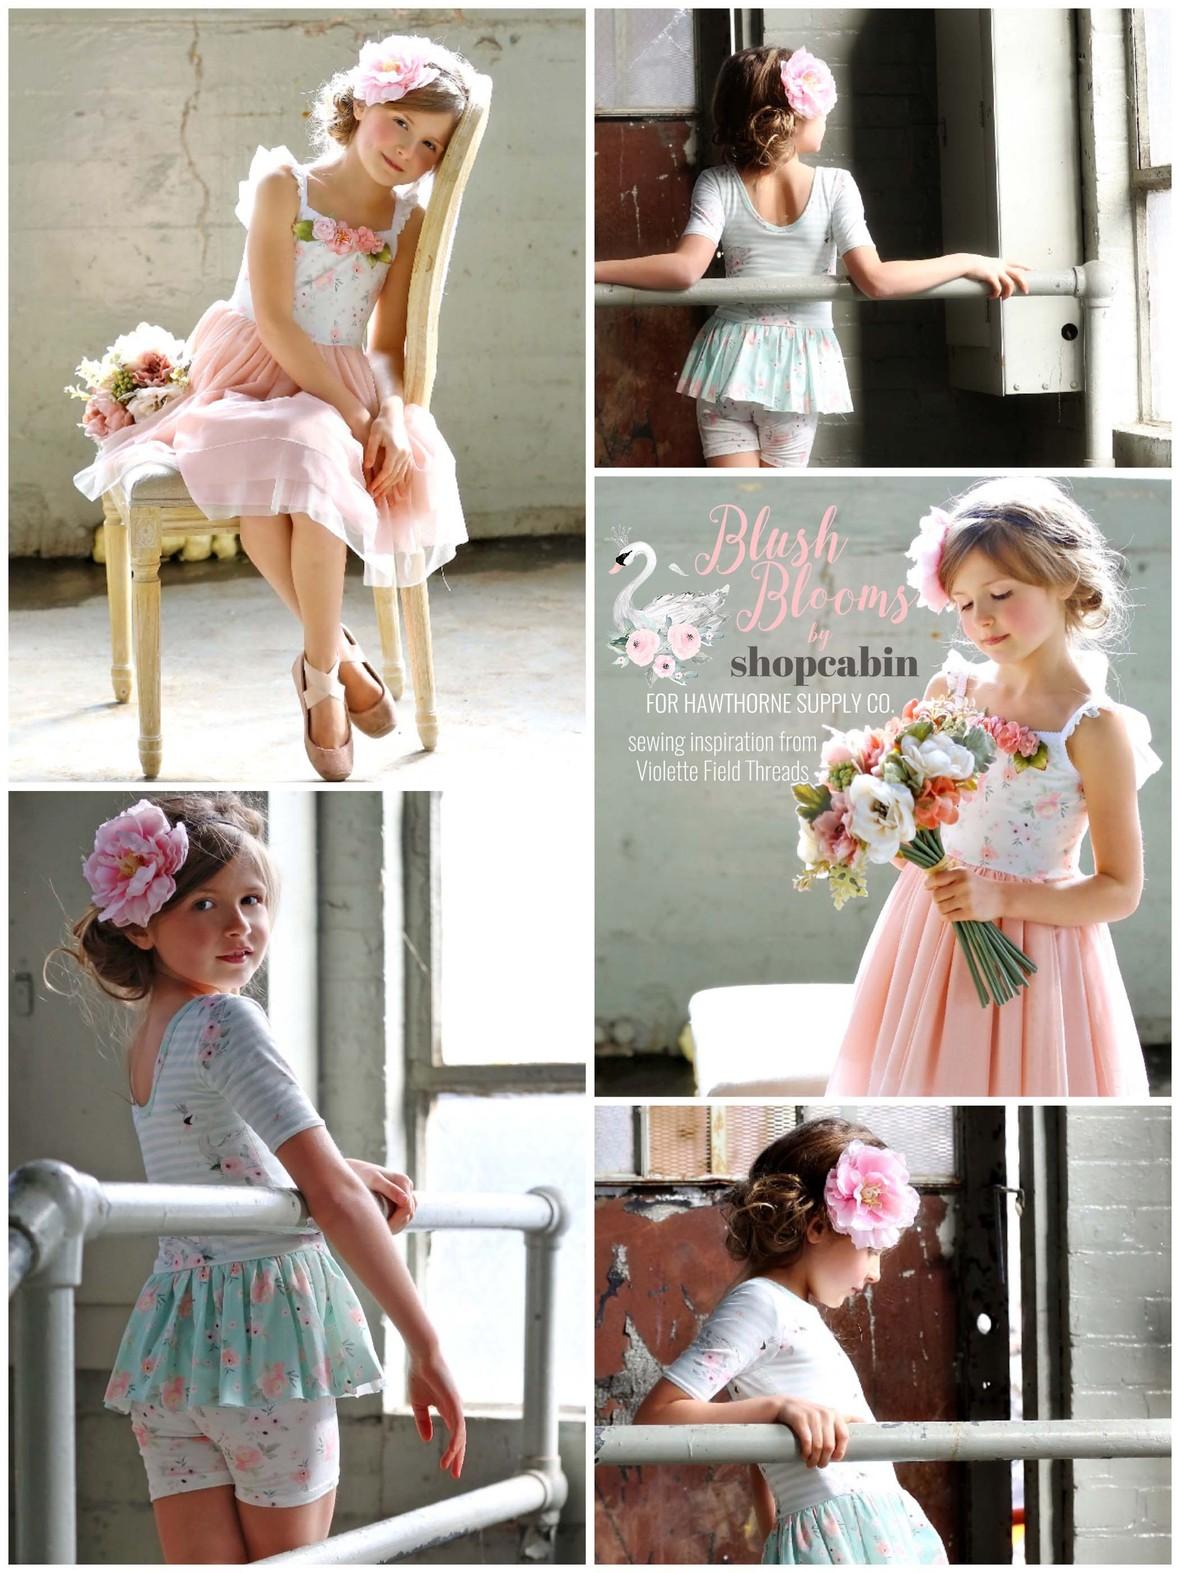 Blush Blooms Fabric Shopcabin at Hawthorne Supply Co